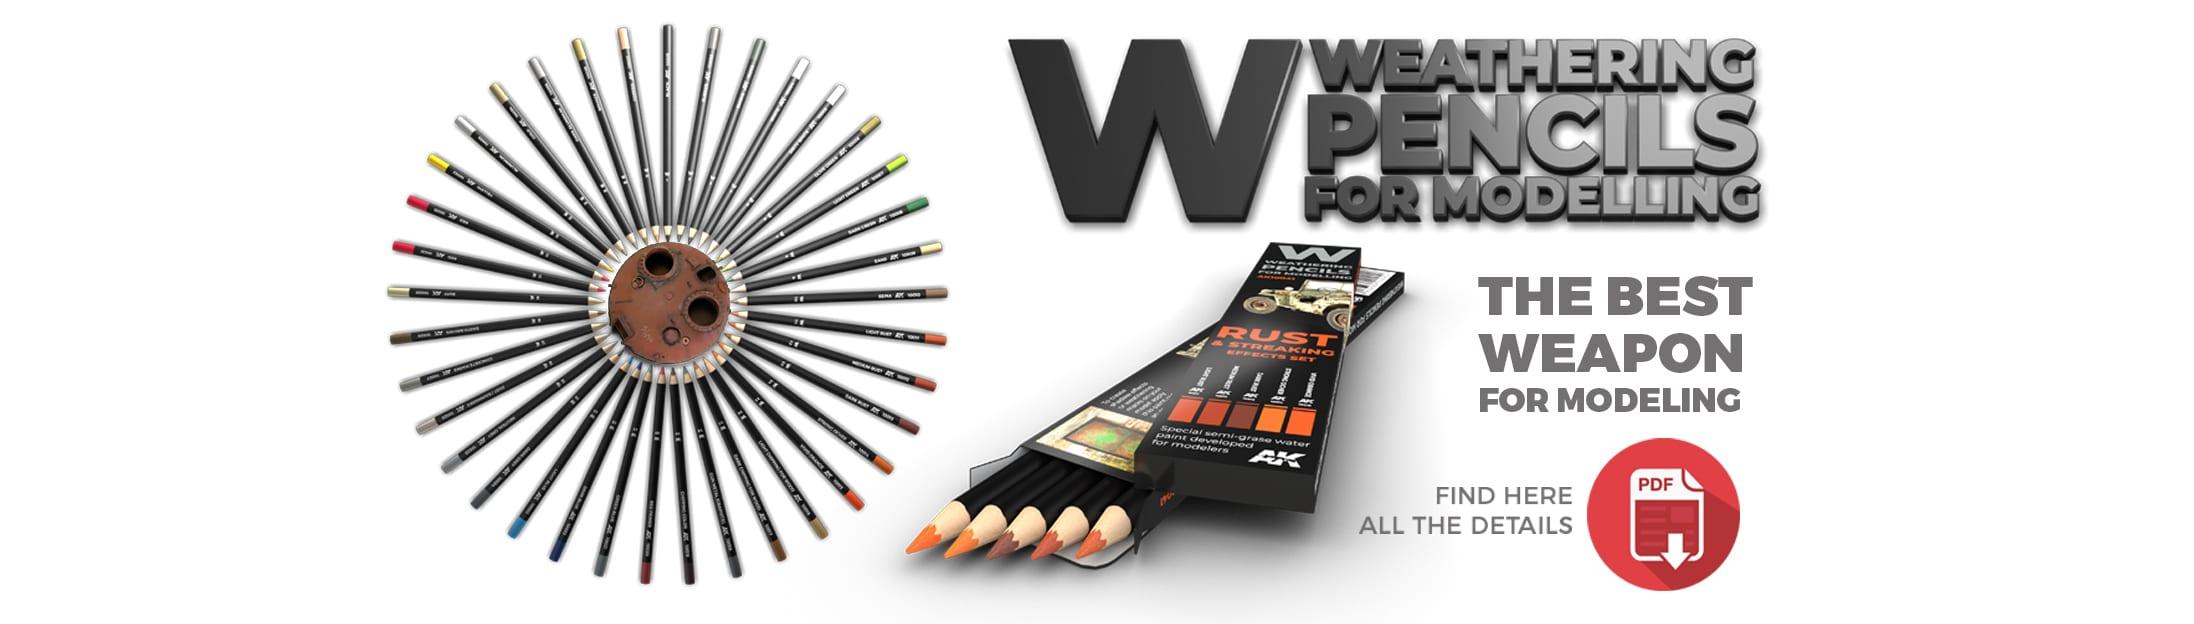 akinteractive weathering pencils campaign set single deluxe